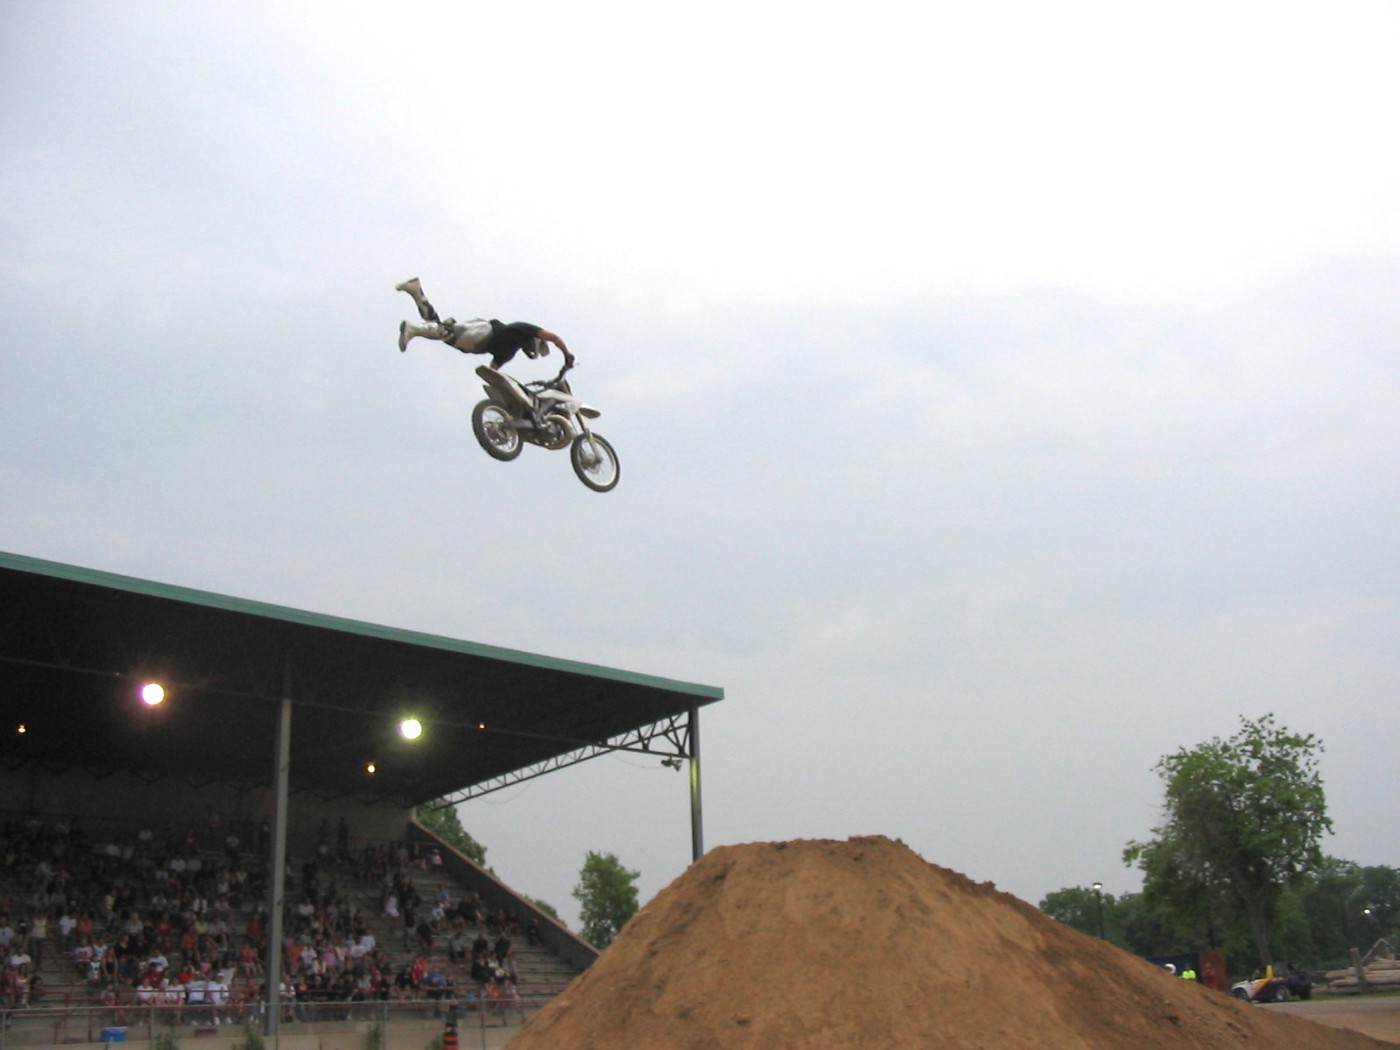 Performing a Superman Seat Grab at the Lindsay Fair in 2006.